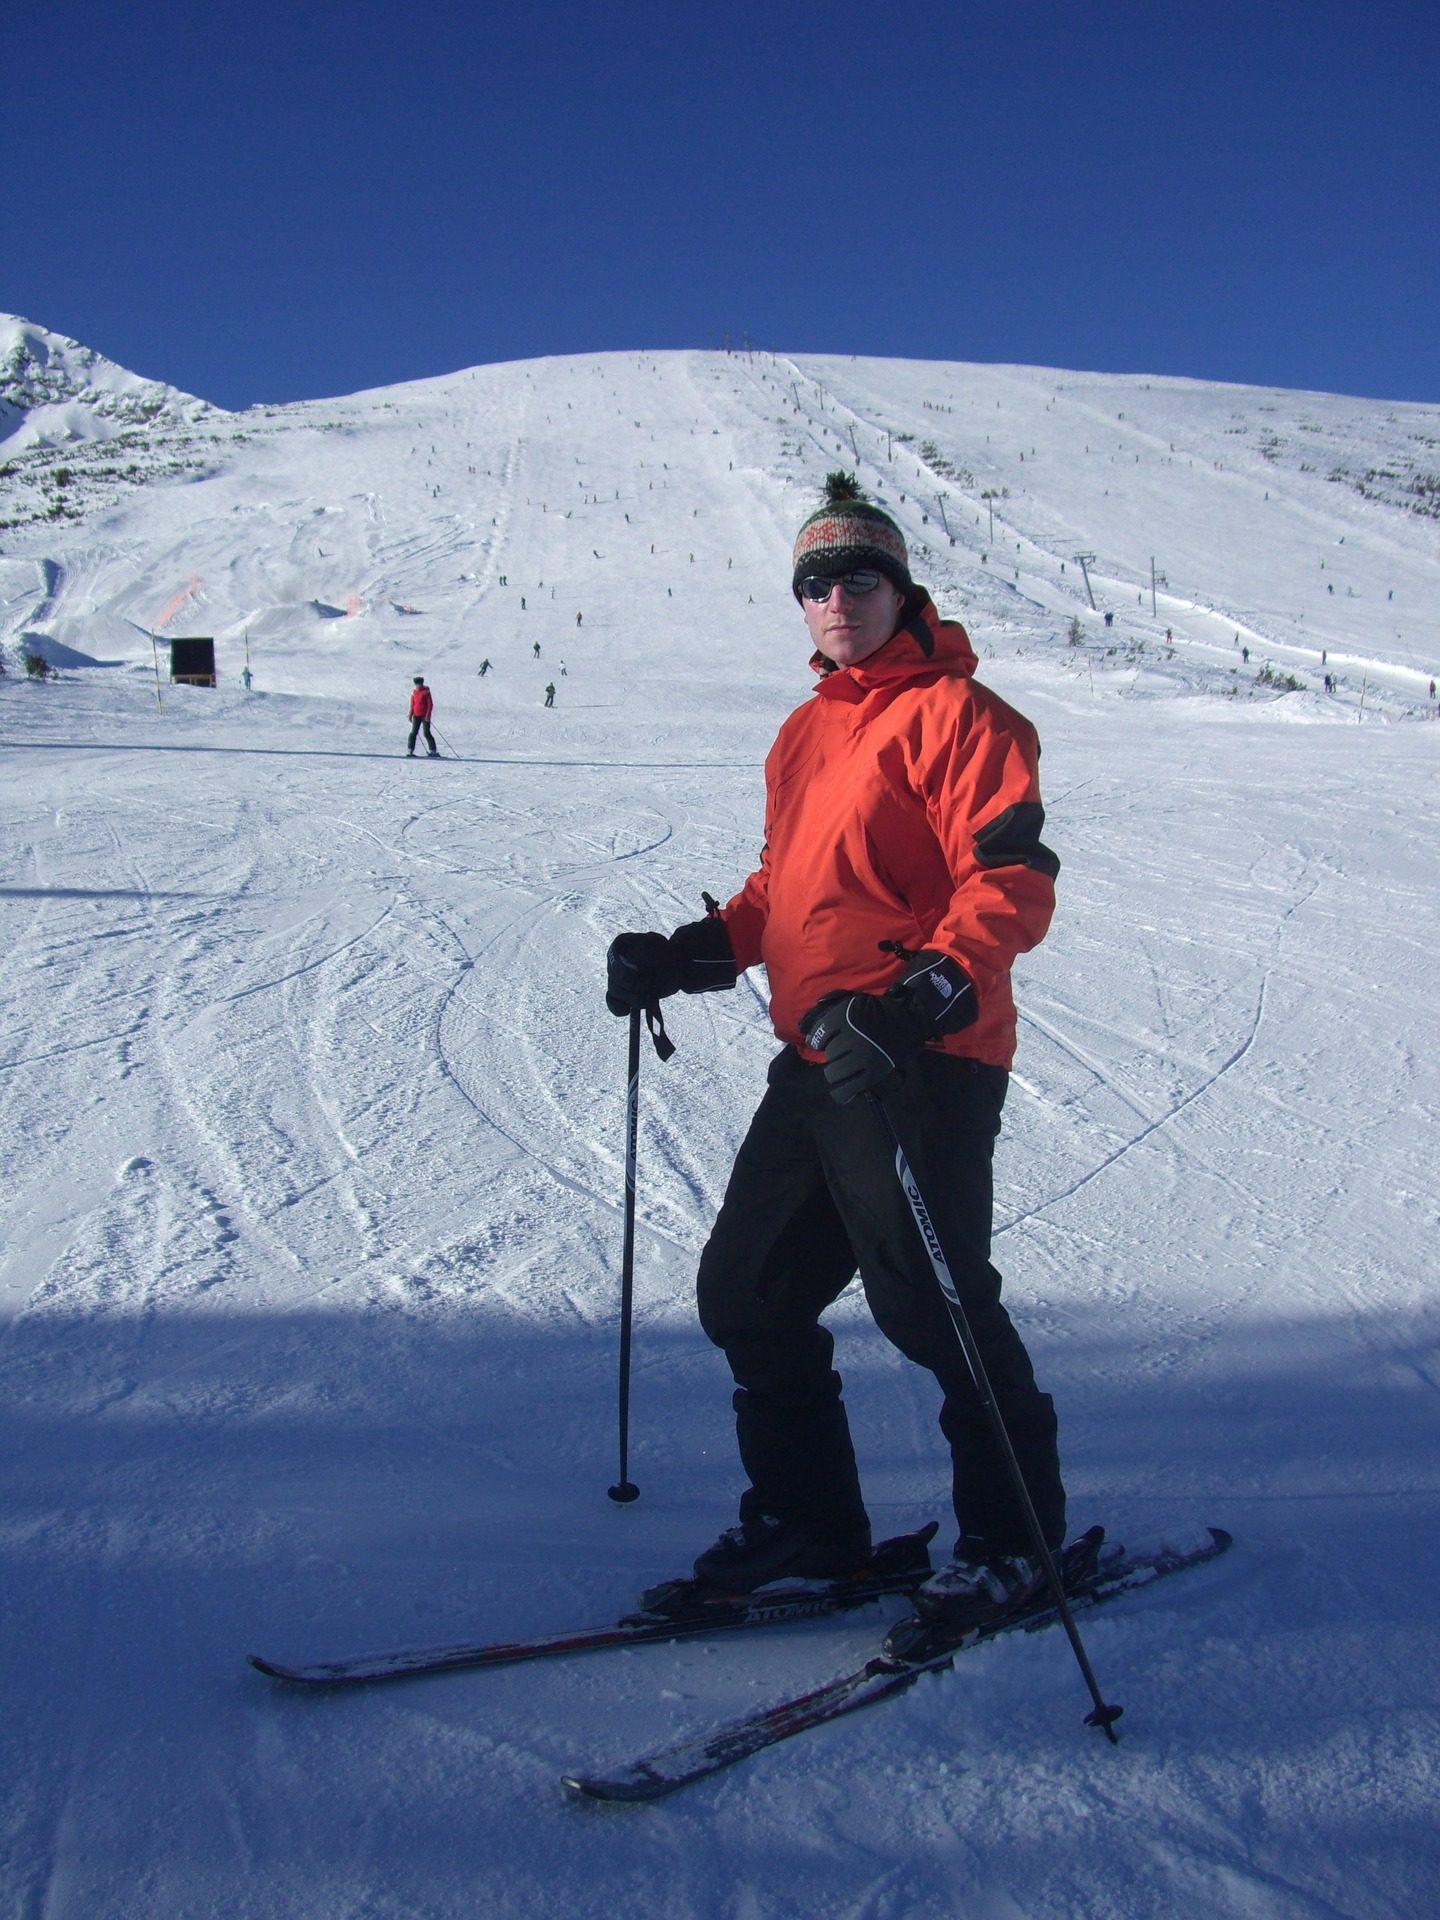 Skiurlaub in Bulgarien - Bansko 3 Sterne Hotel ab 159,00€ p.P - Halbpension